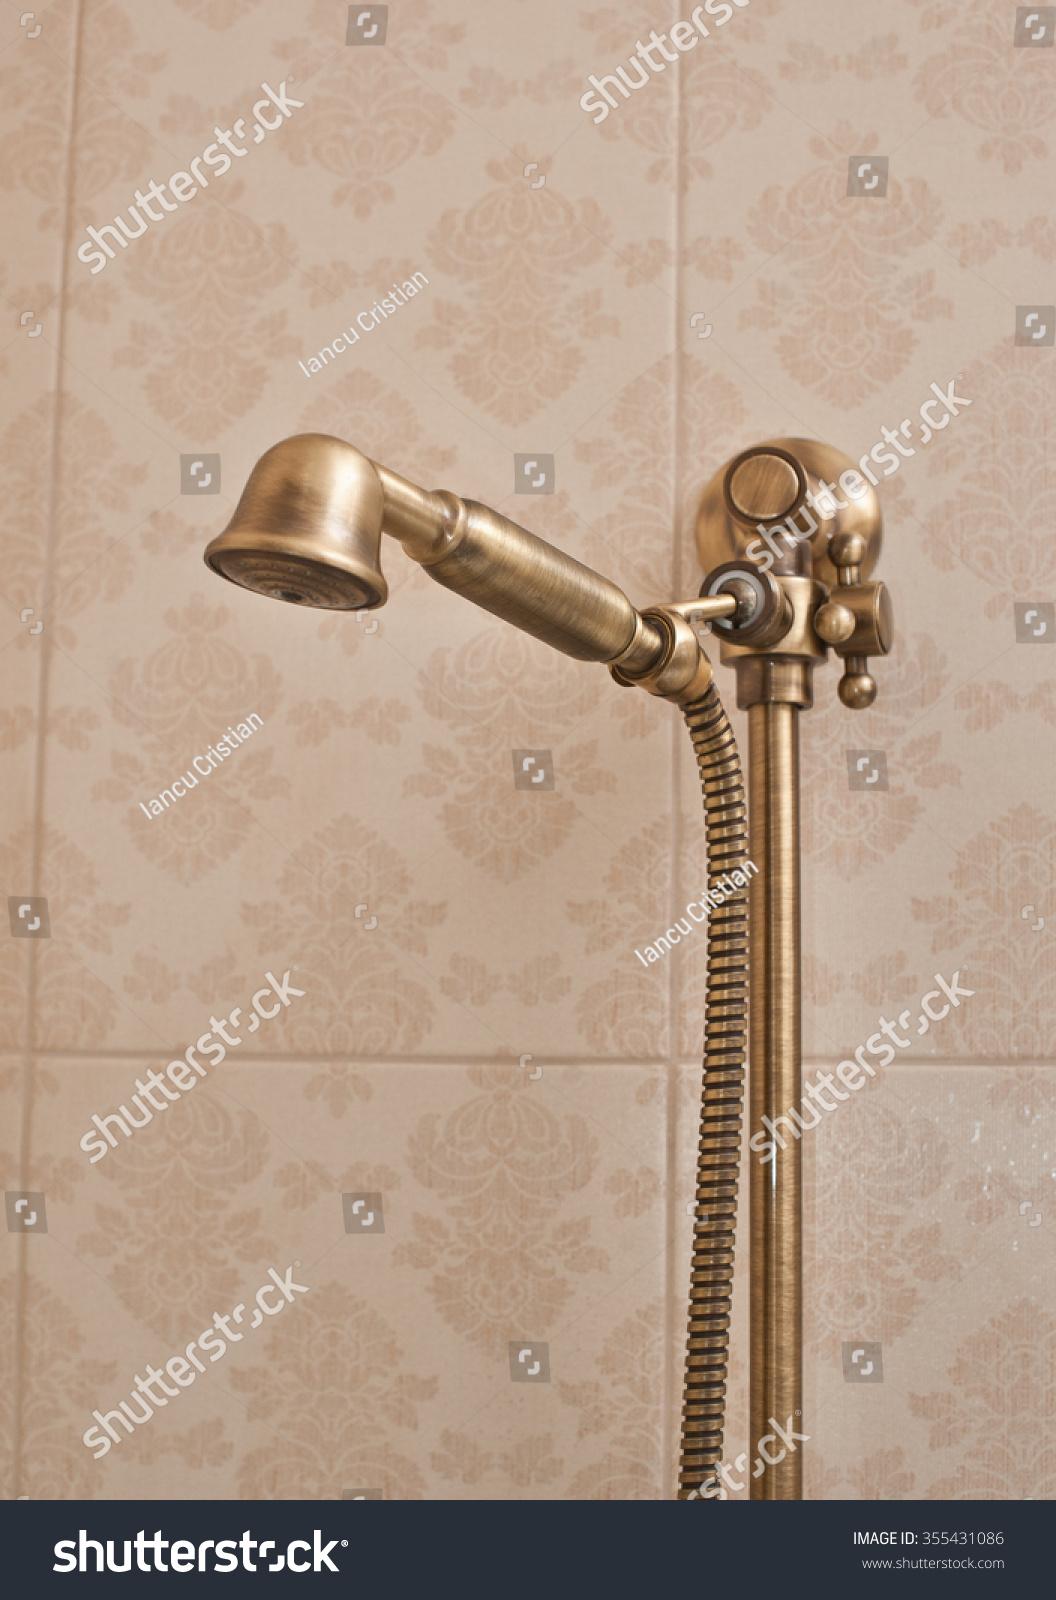 Golden Shower Head On Wall Faience Stock Photo 355431086 ...